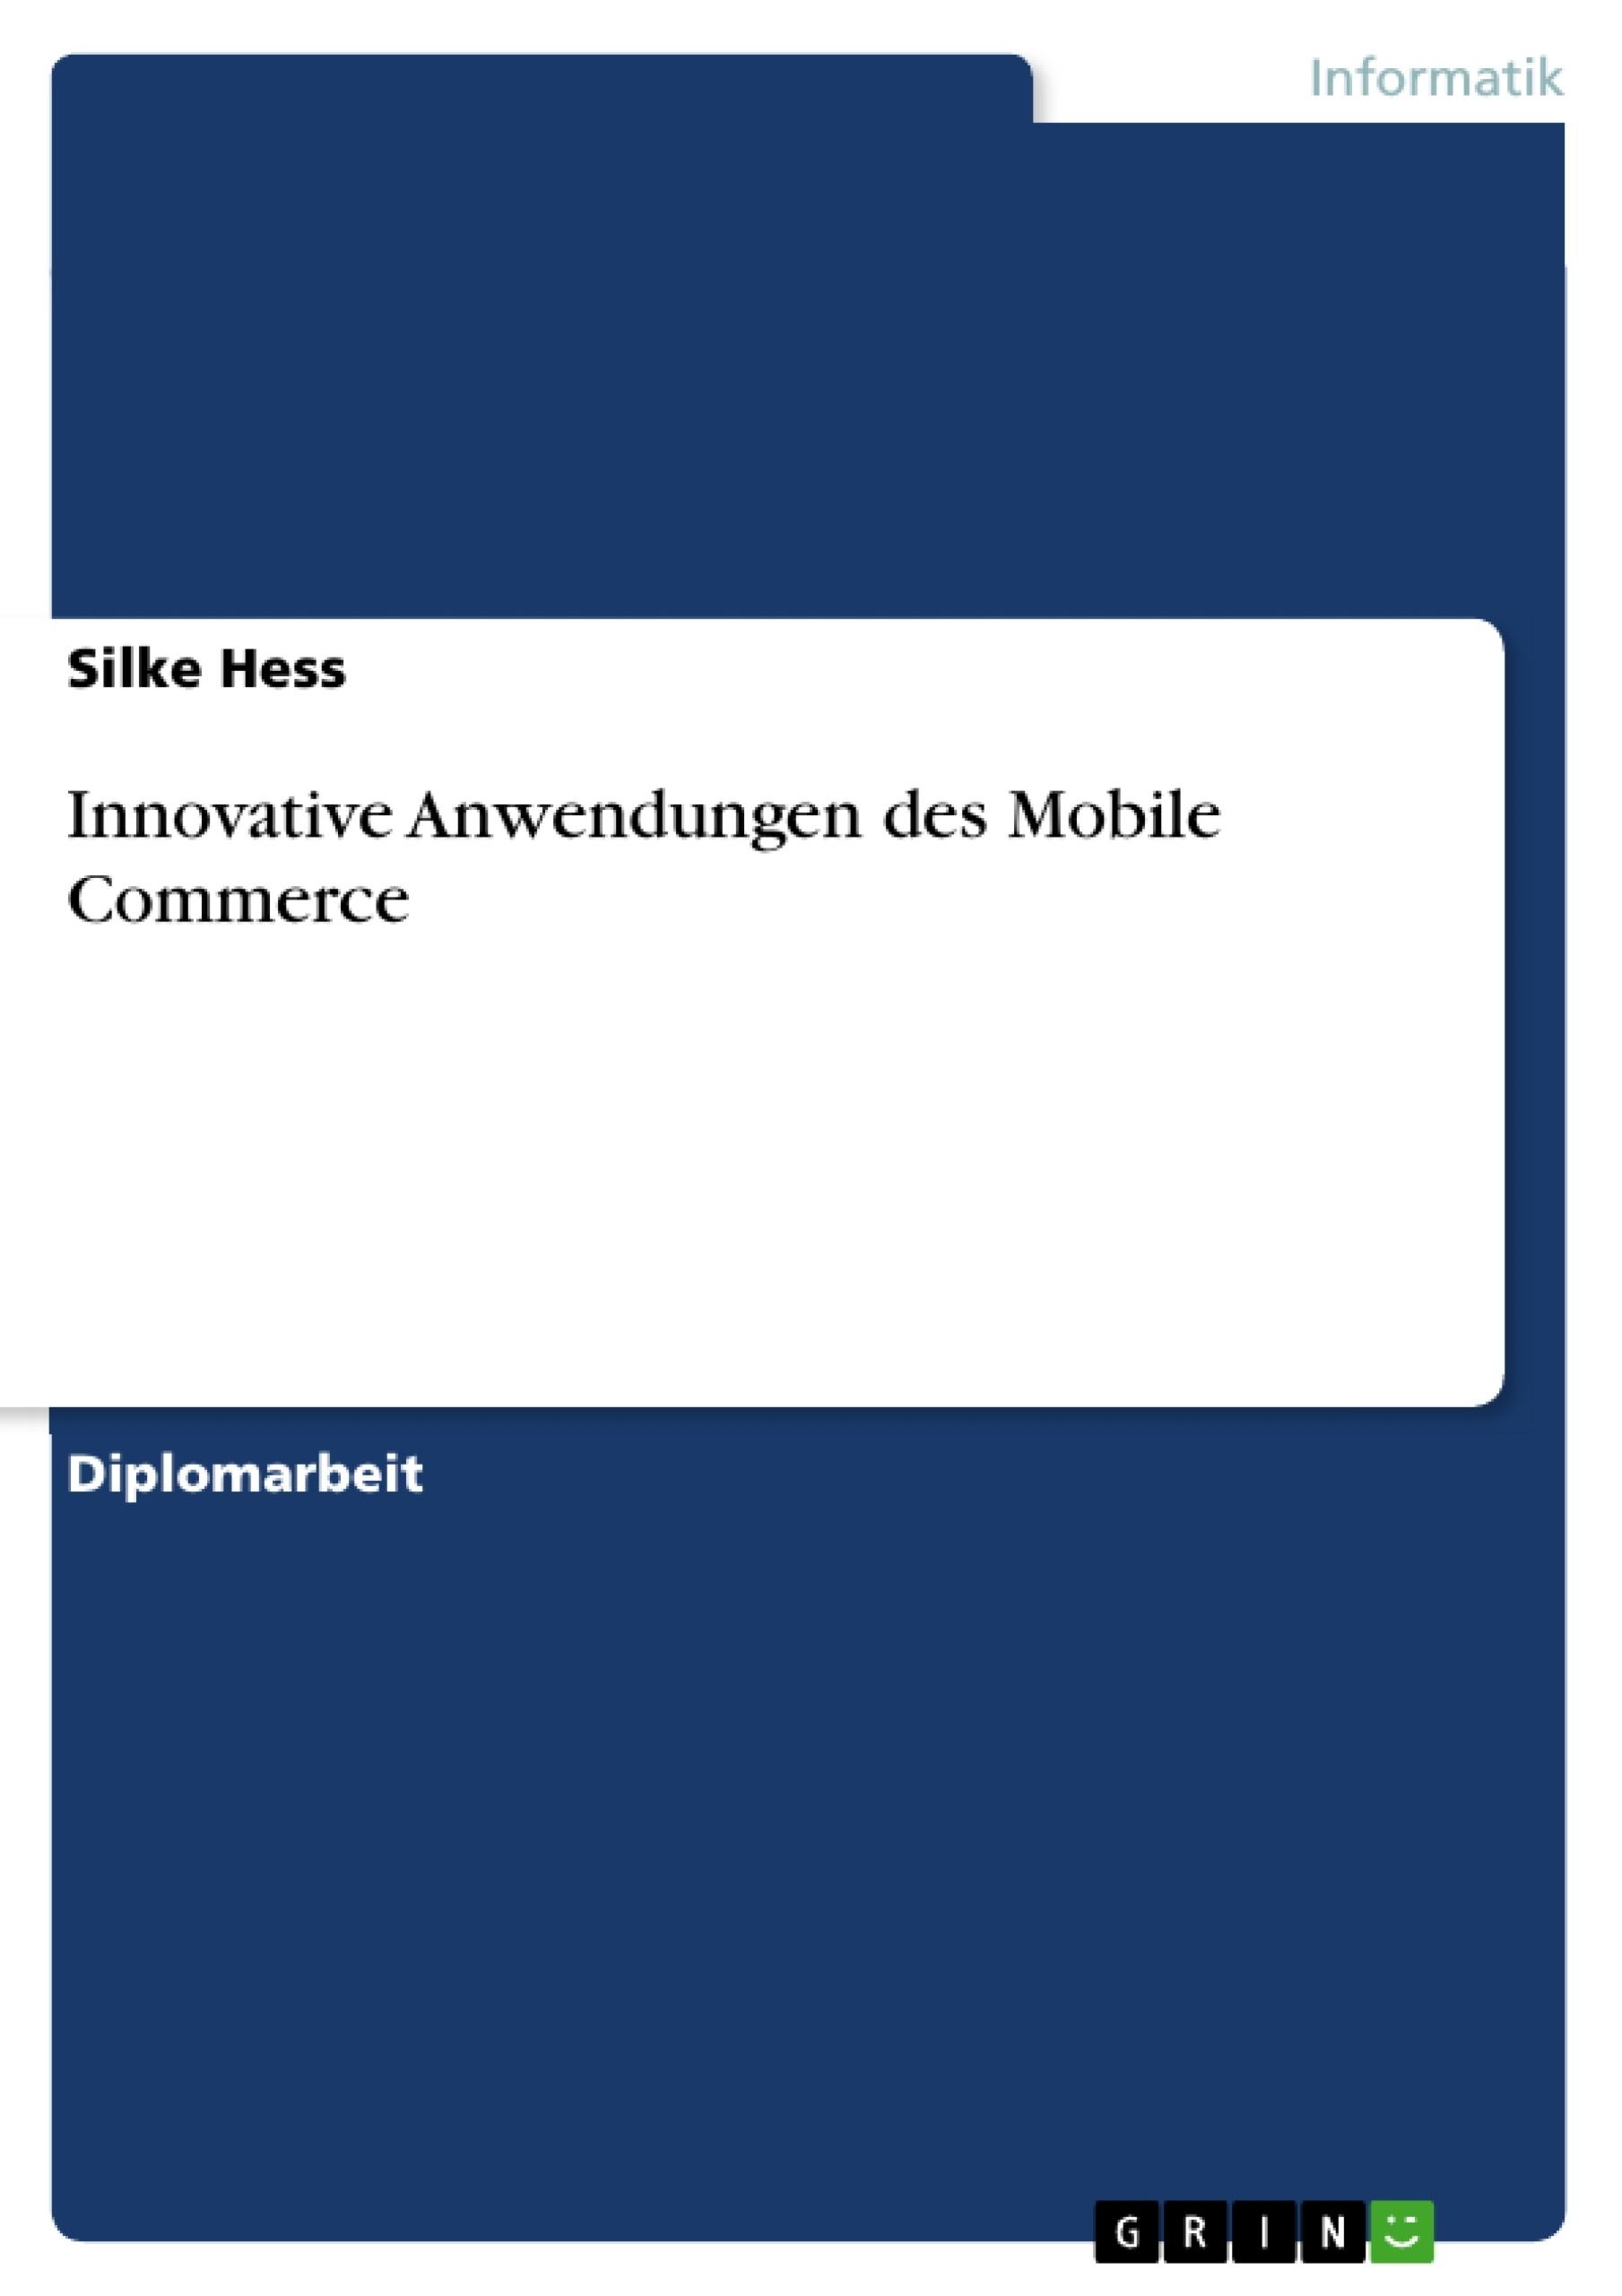 Titel: Innovative Anwendungen des Mobile Commerce